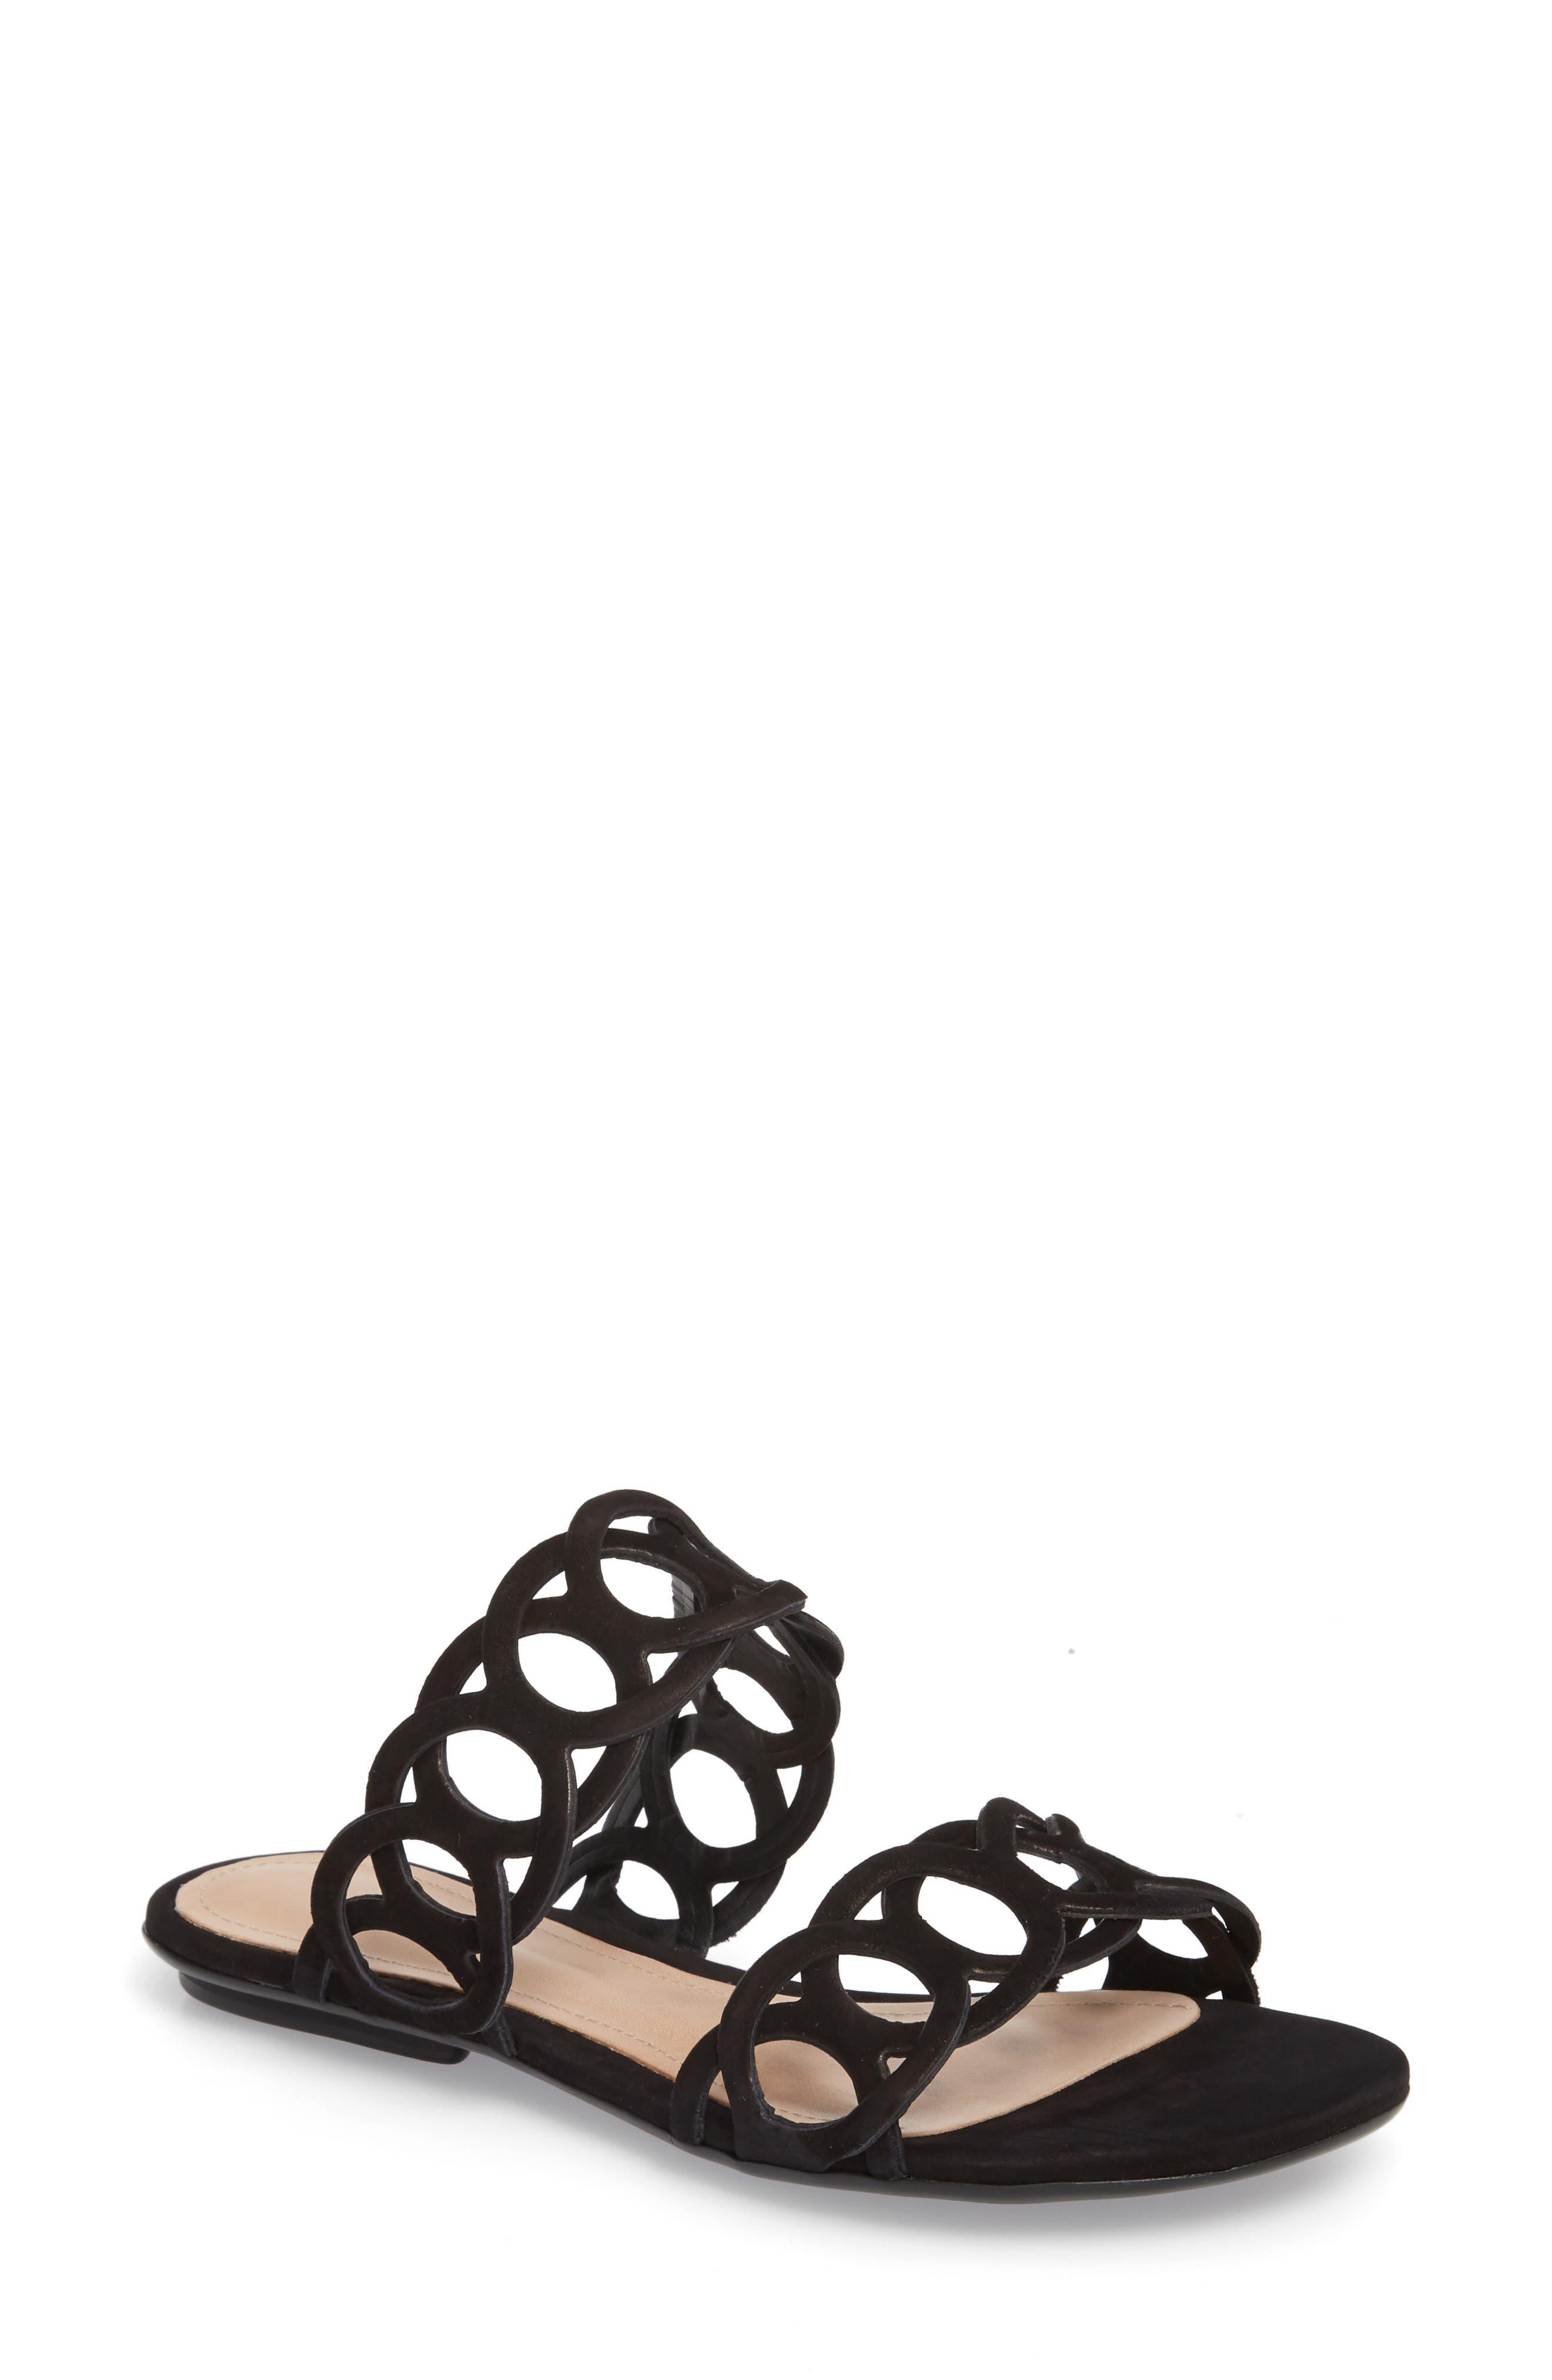 Yaslin Slide Sandal,                         Main,                         color, 006